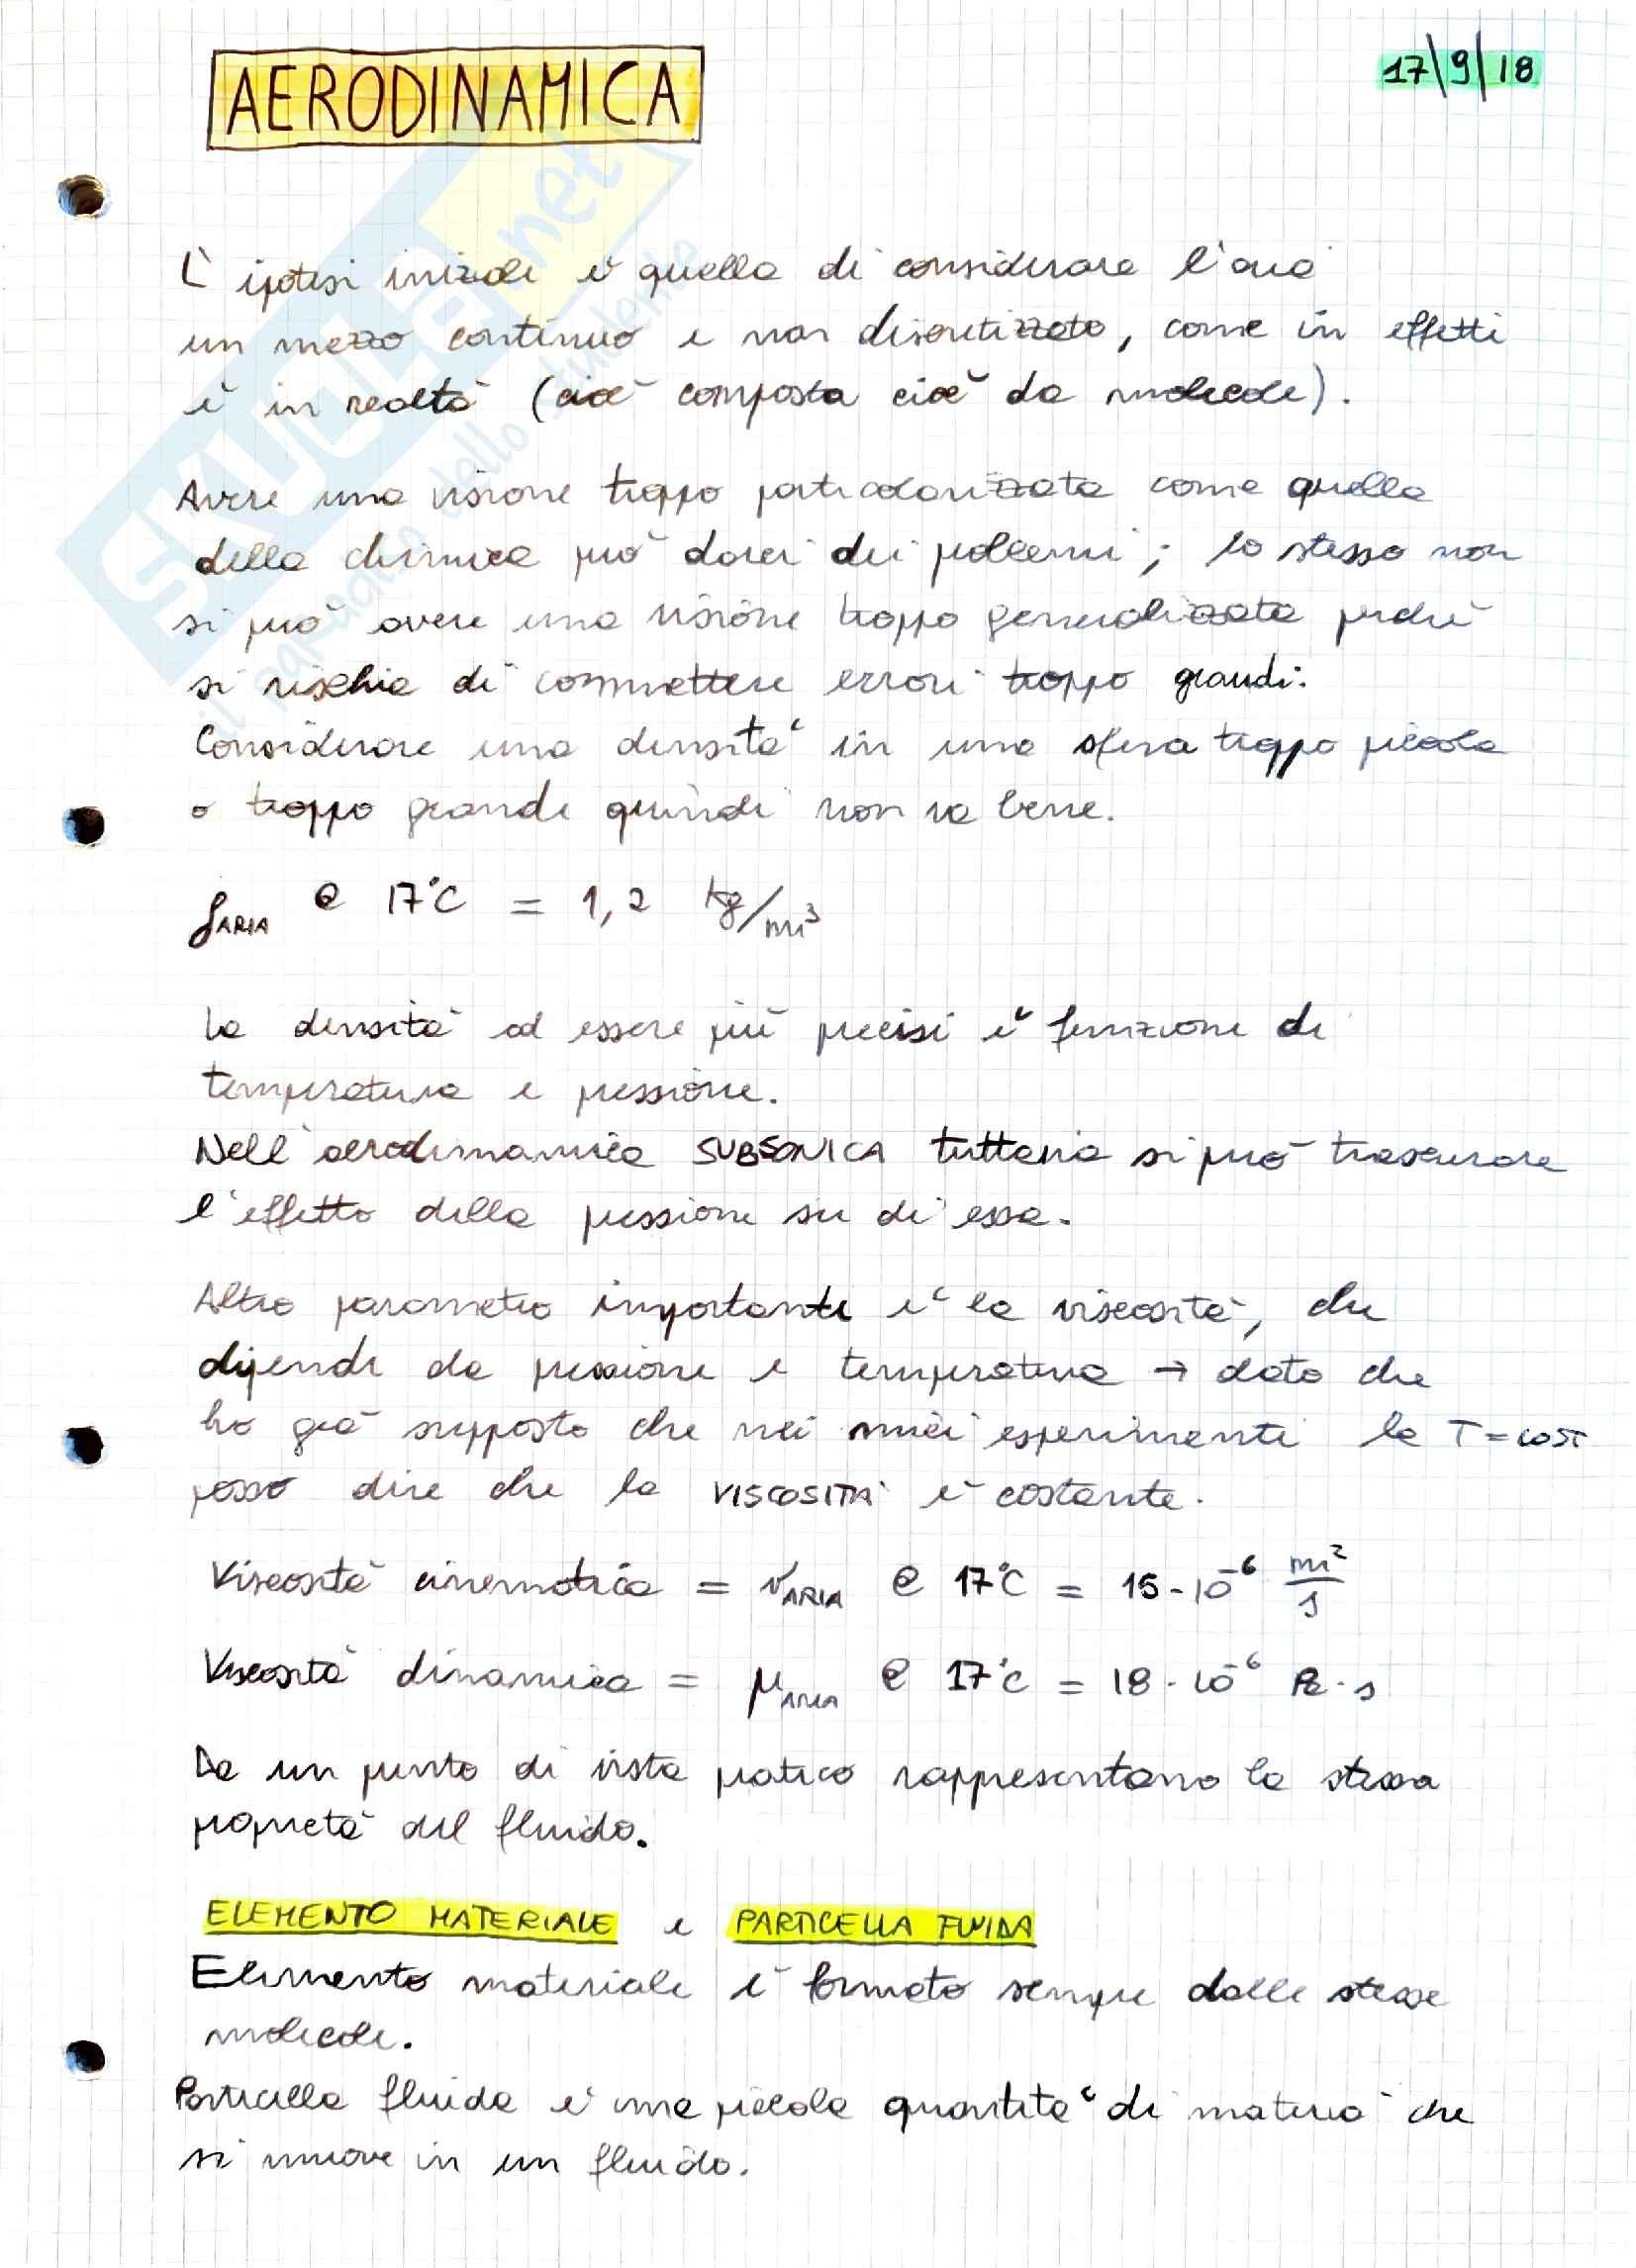 Appunti Aerodinamica Parte I, prof. Stalio